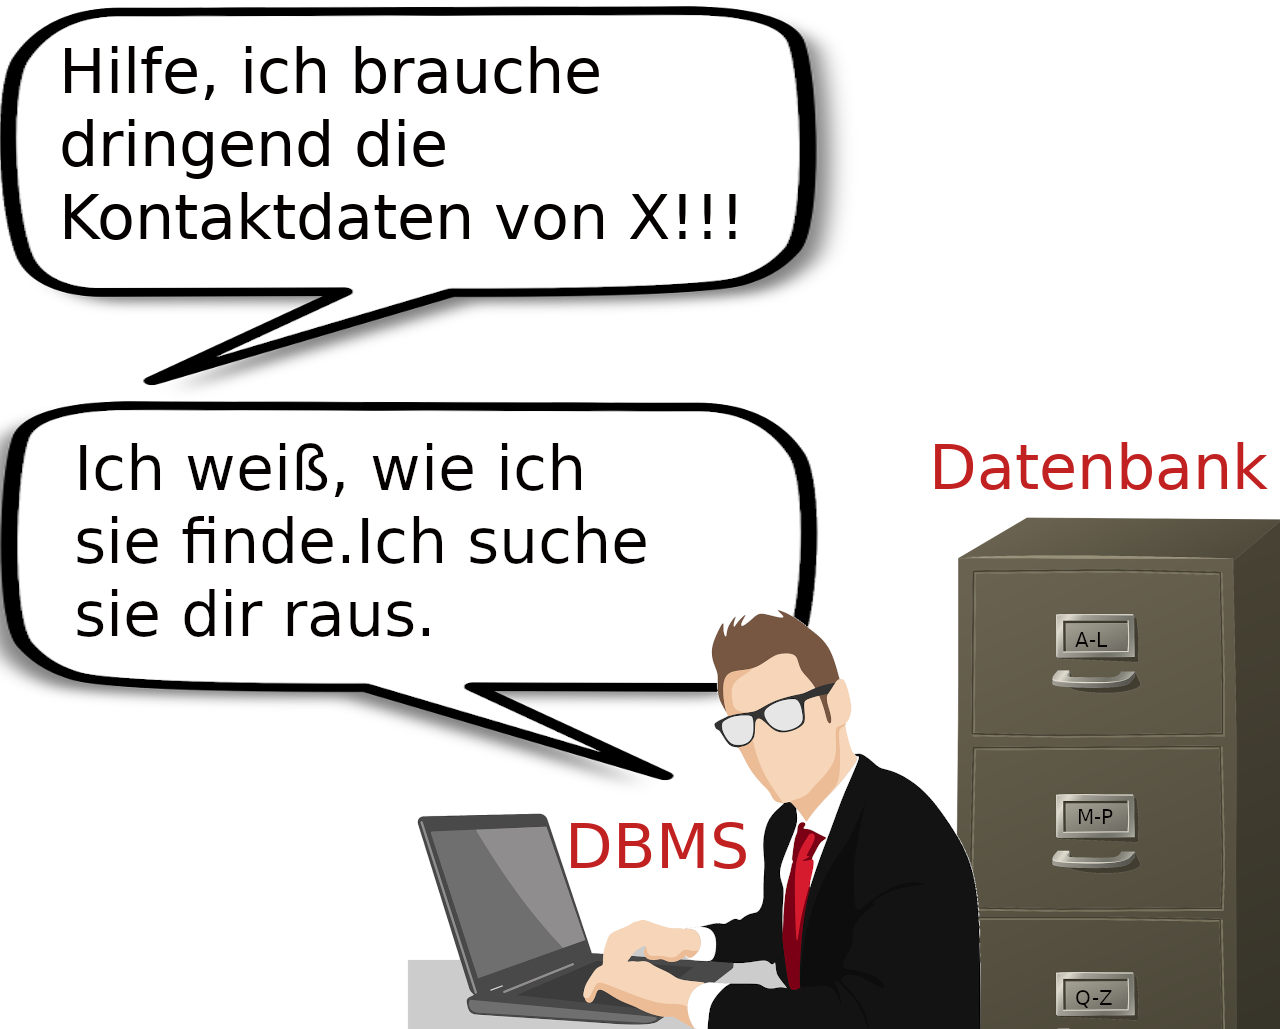 DBMS im echten Leben